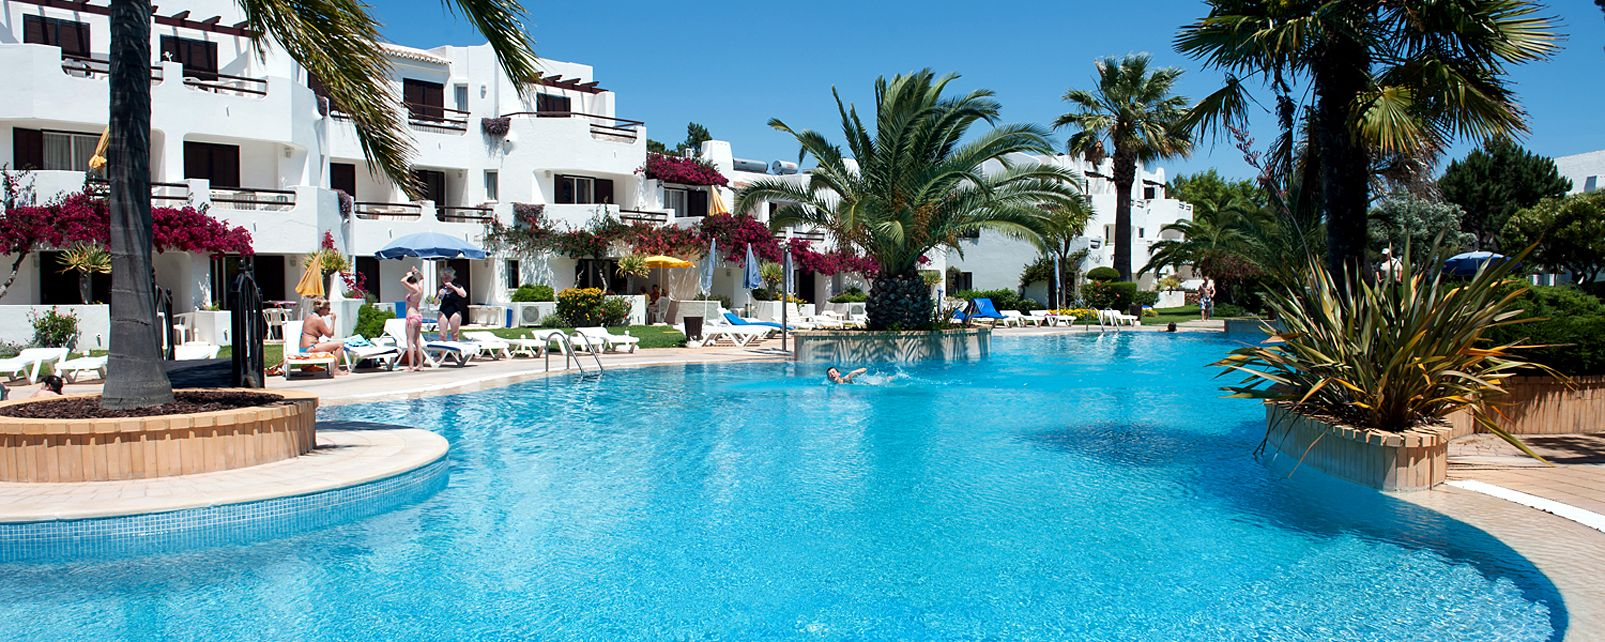 Hotel Balaia Golf Village Resort And Golf